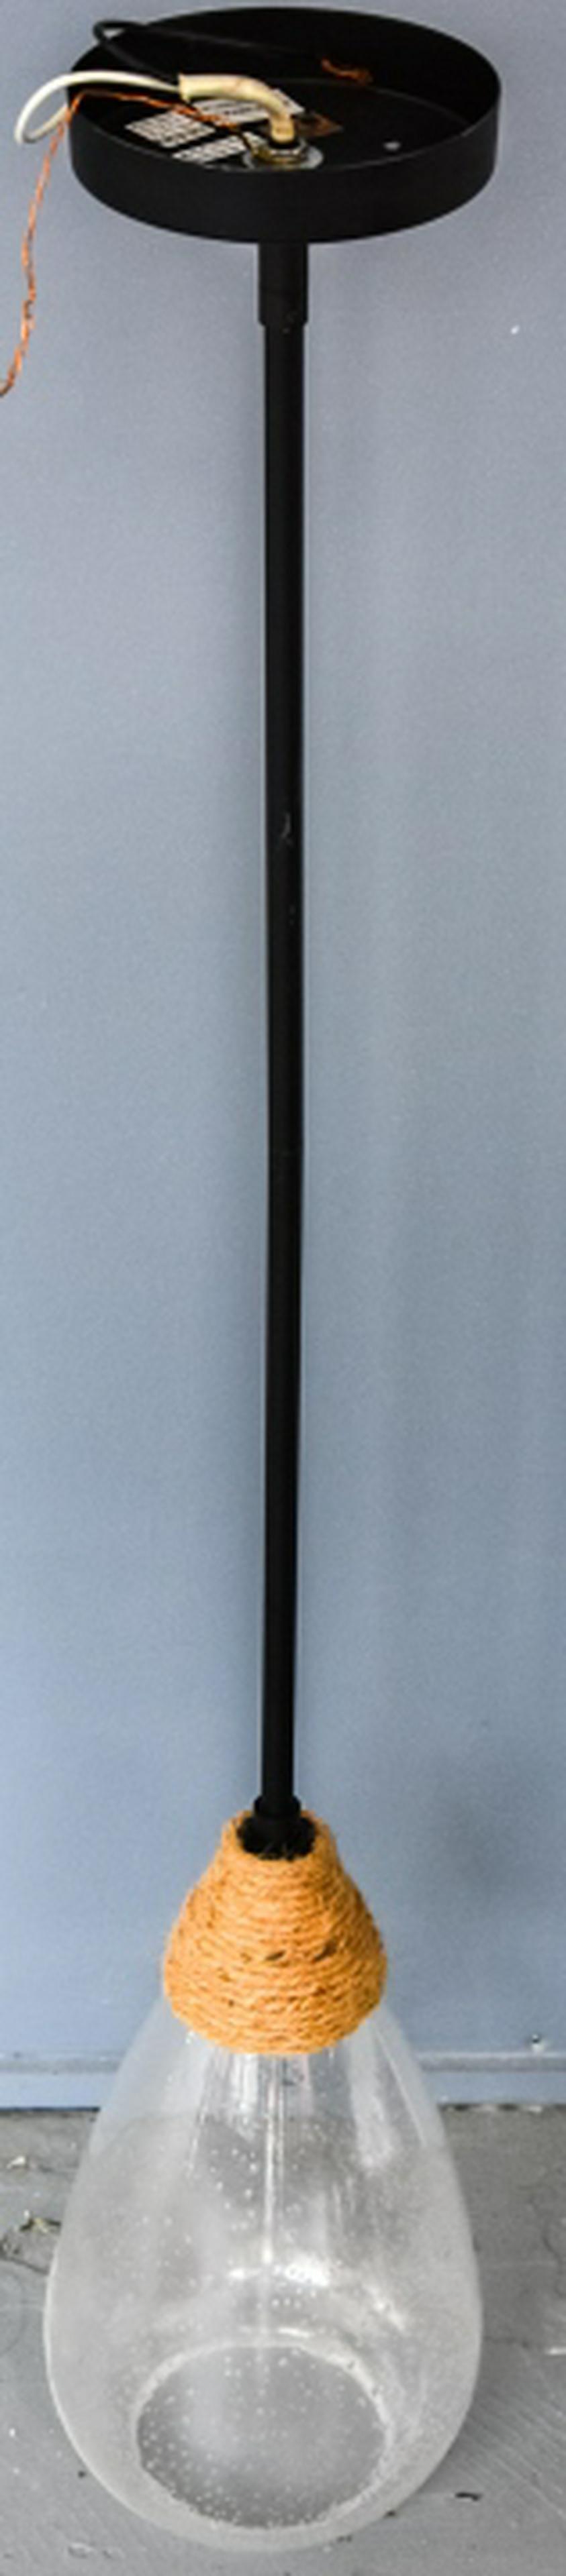 Contemporary Modern Pendant Light Chandelier